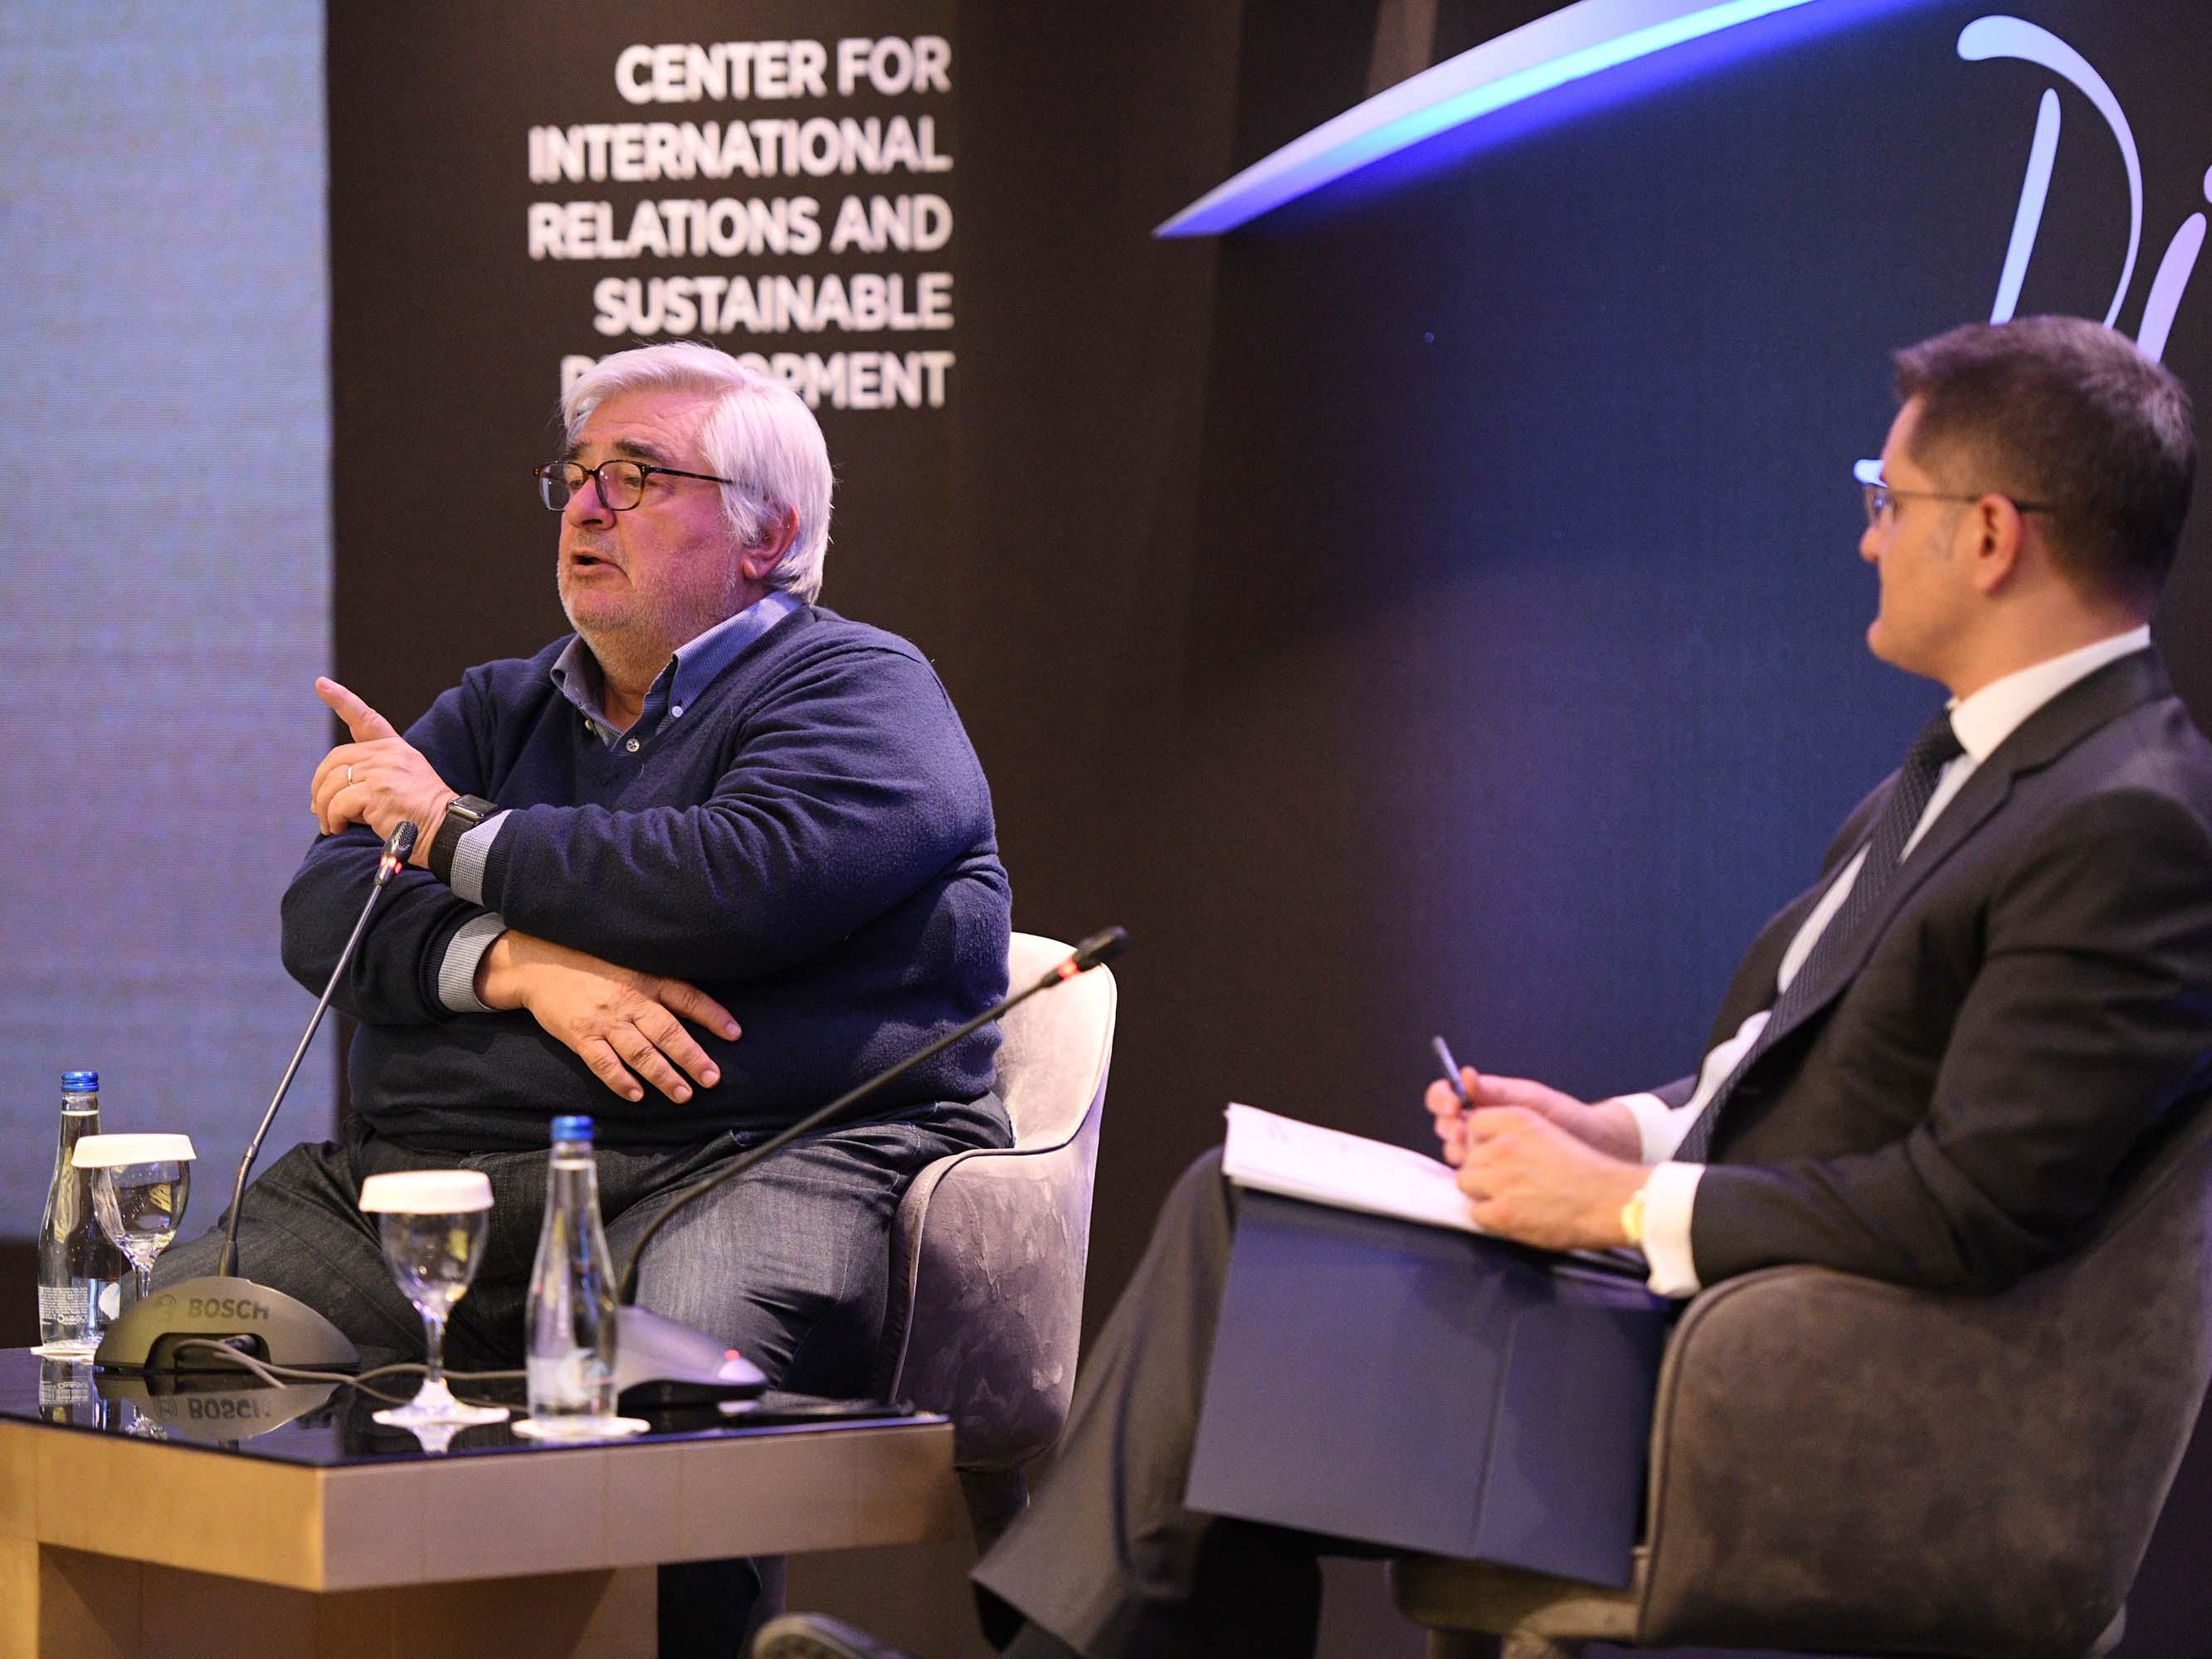 Džon Rendon i Vuk Jeremić o demokratiji u doba botova i nestabilnosti | Horizons Discussion